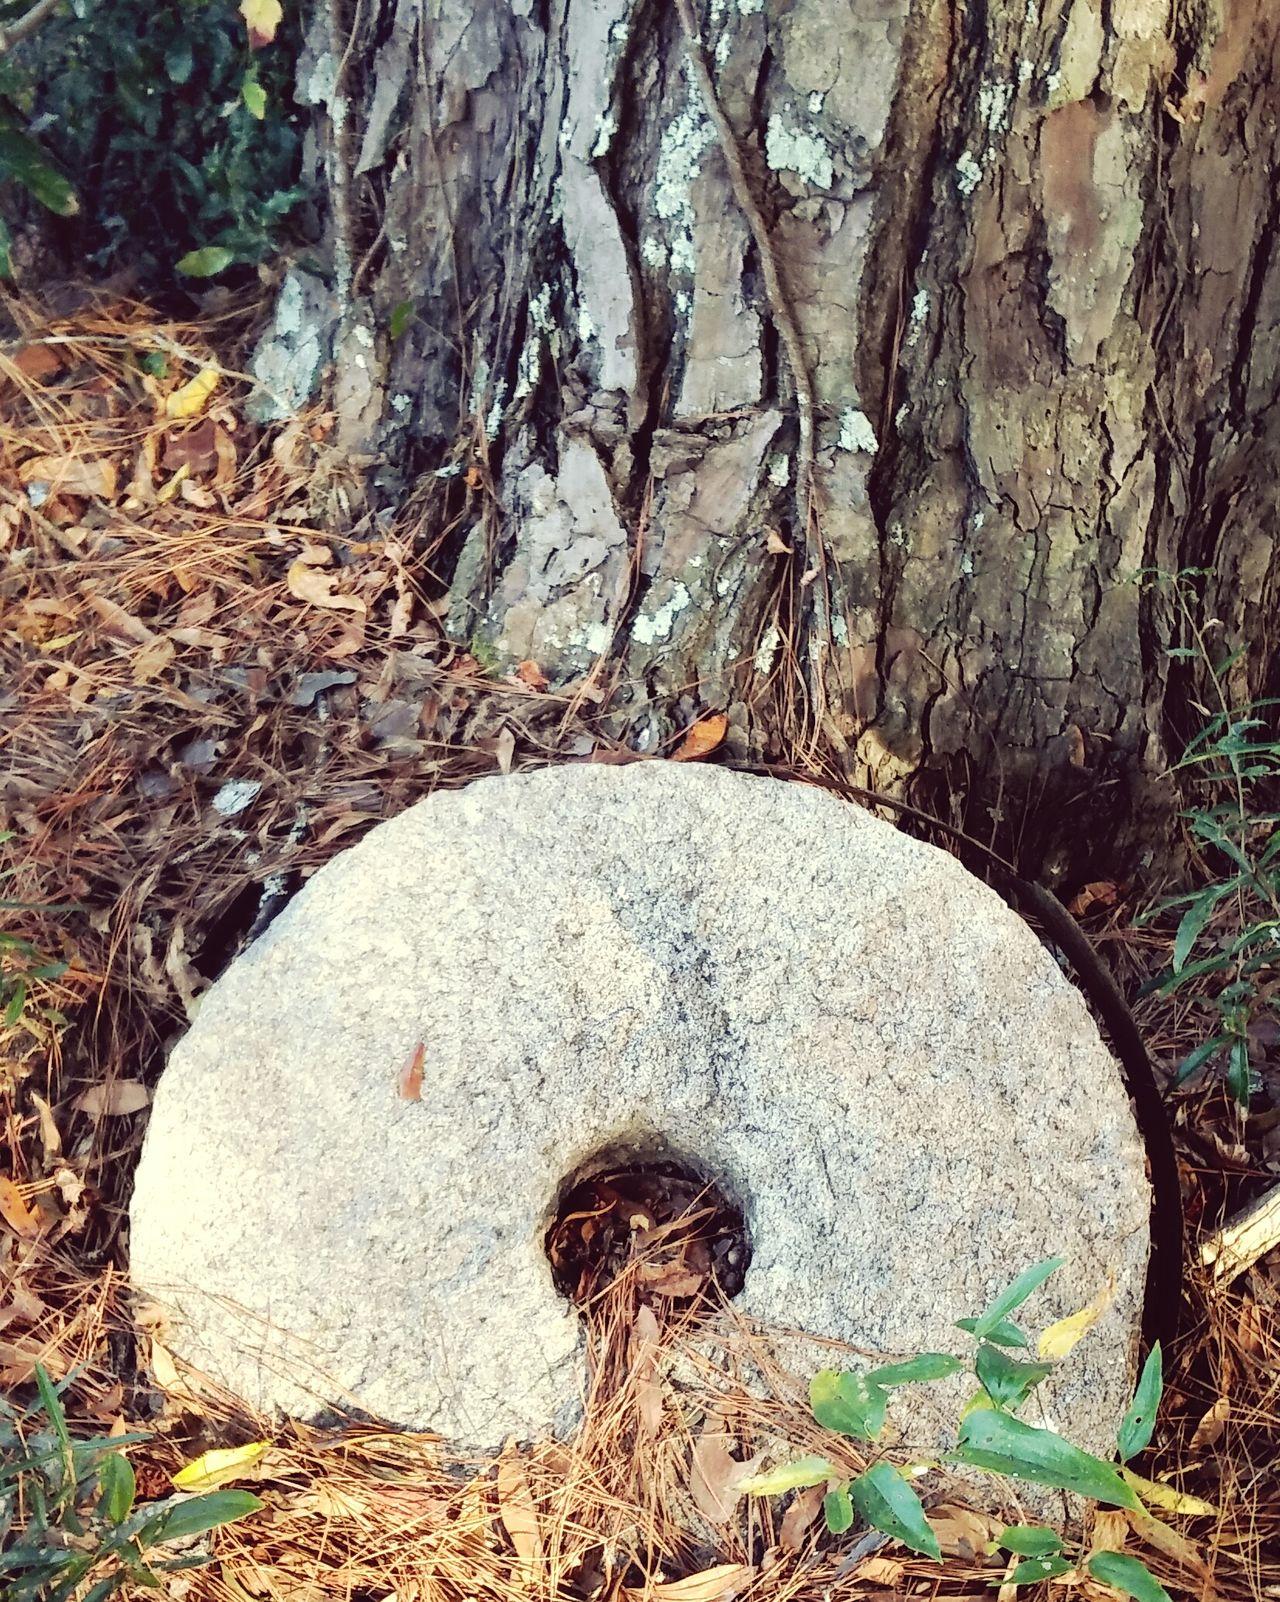 Vintage grinding stone Nature Outdoors Abandoned No People Close-up Vintage Grinding Stone First Eyeem Photo